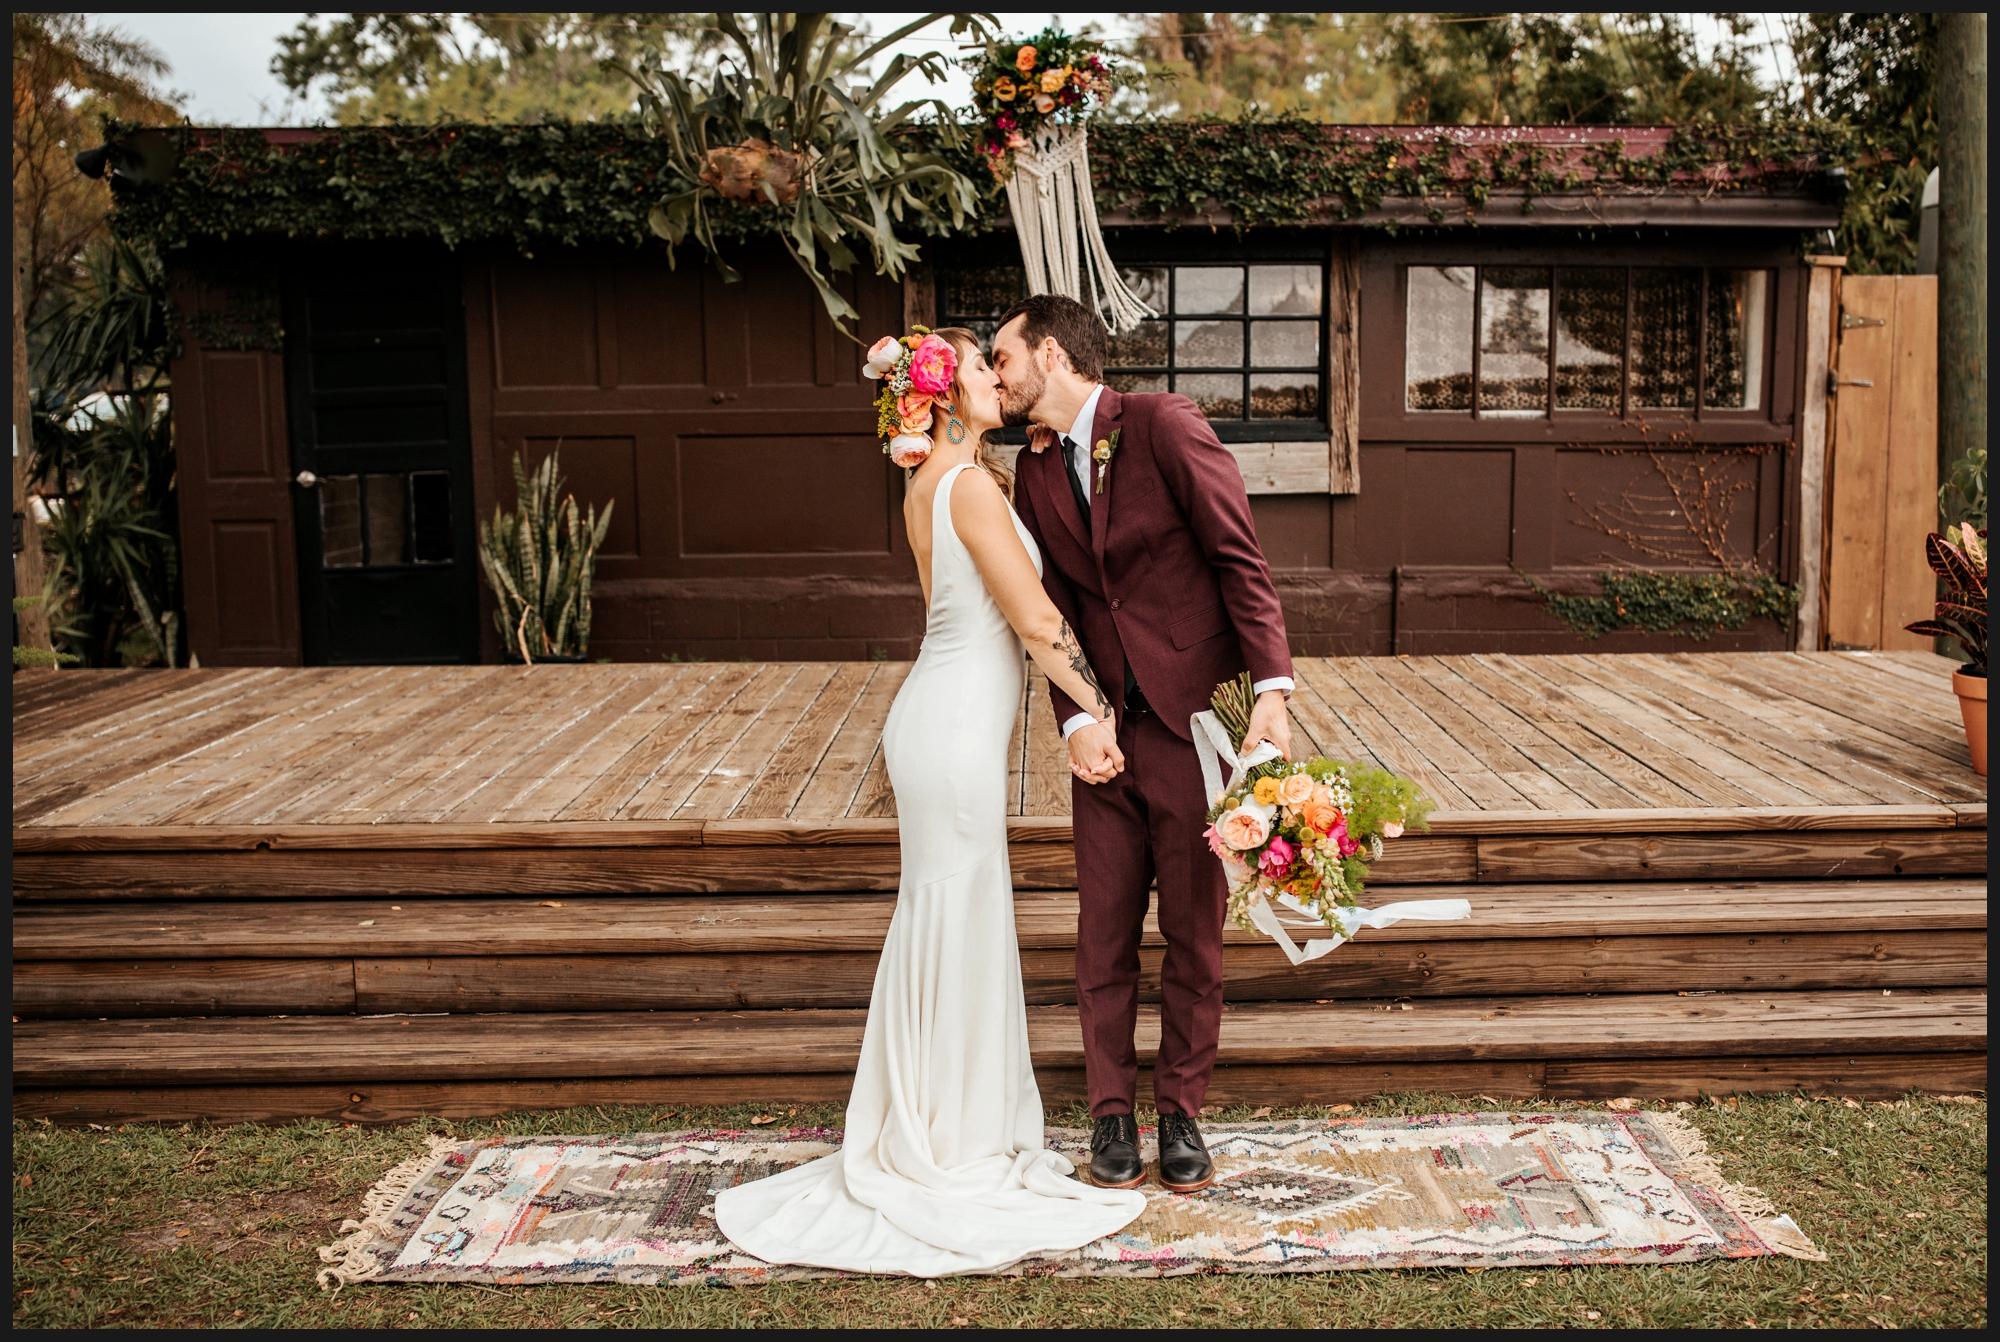 Orlando-Wedding-Photographer-destination-wedding-photographer-florida-wedding-photographer-bohemian-wedding-photographer_2017.jpg